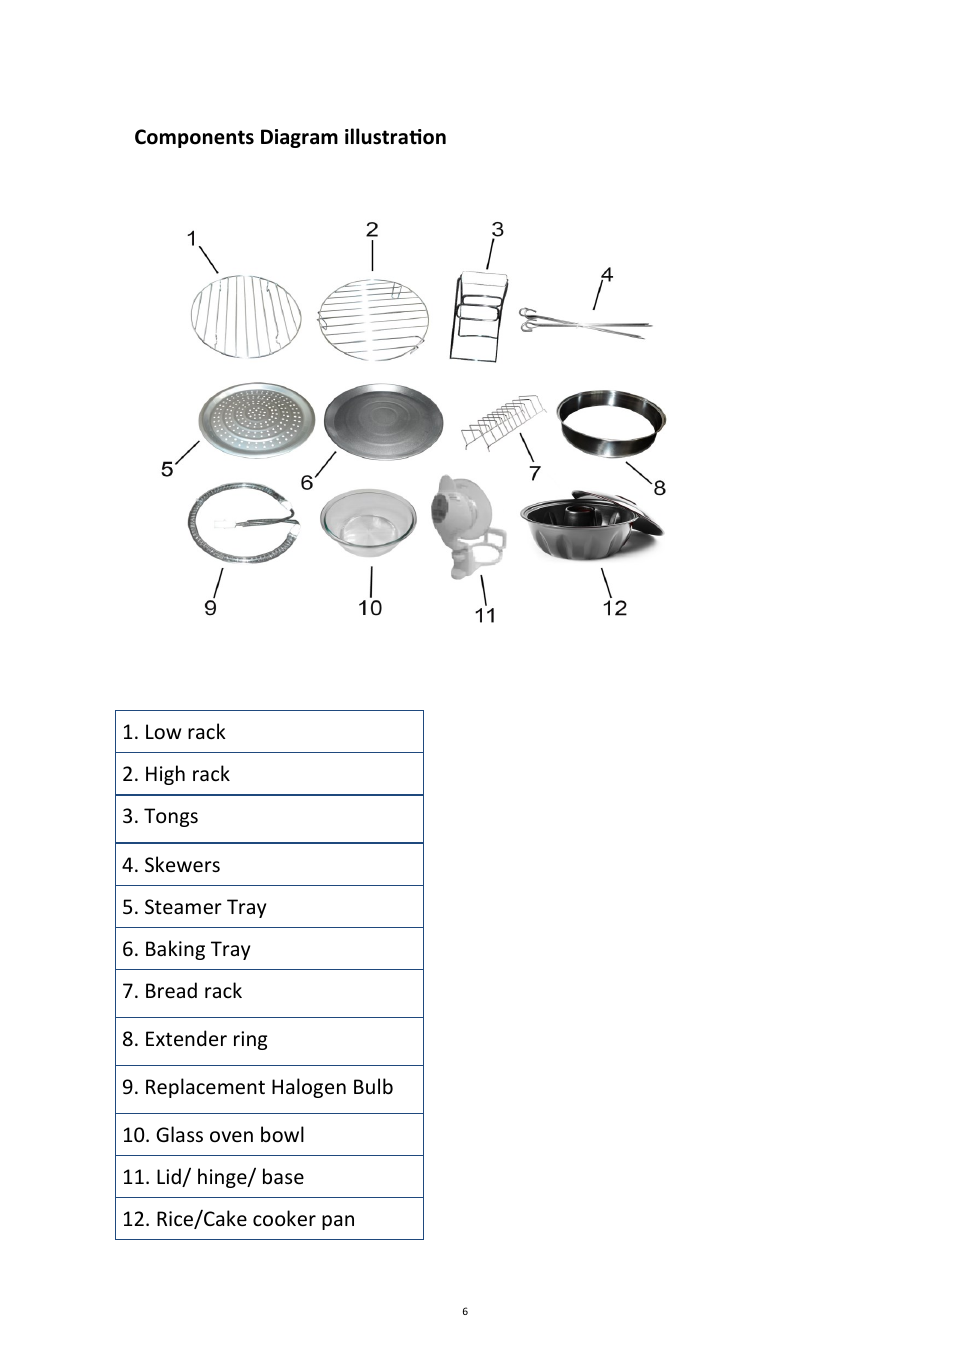 Andrew James Aj000215 12l Premium Digital Halogen Oven With Hinged Lid User Manual